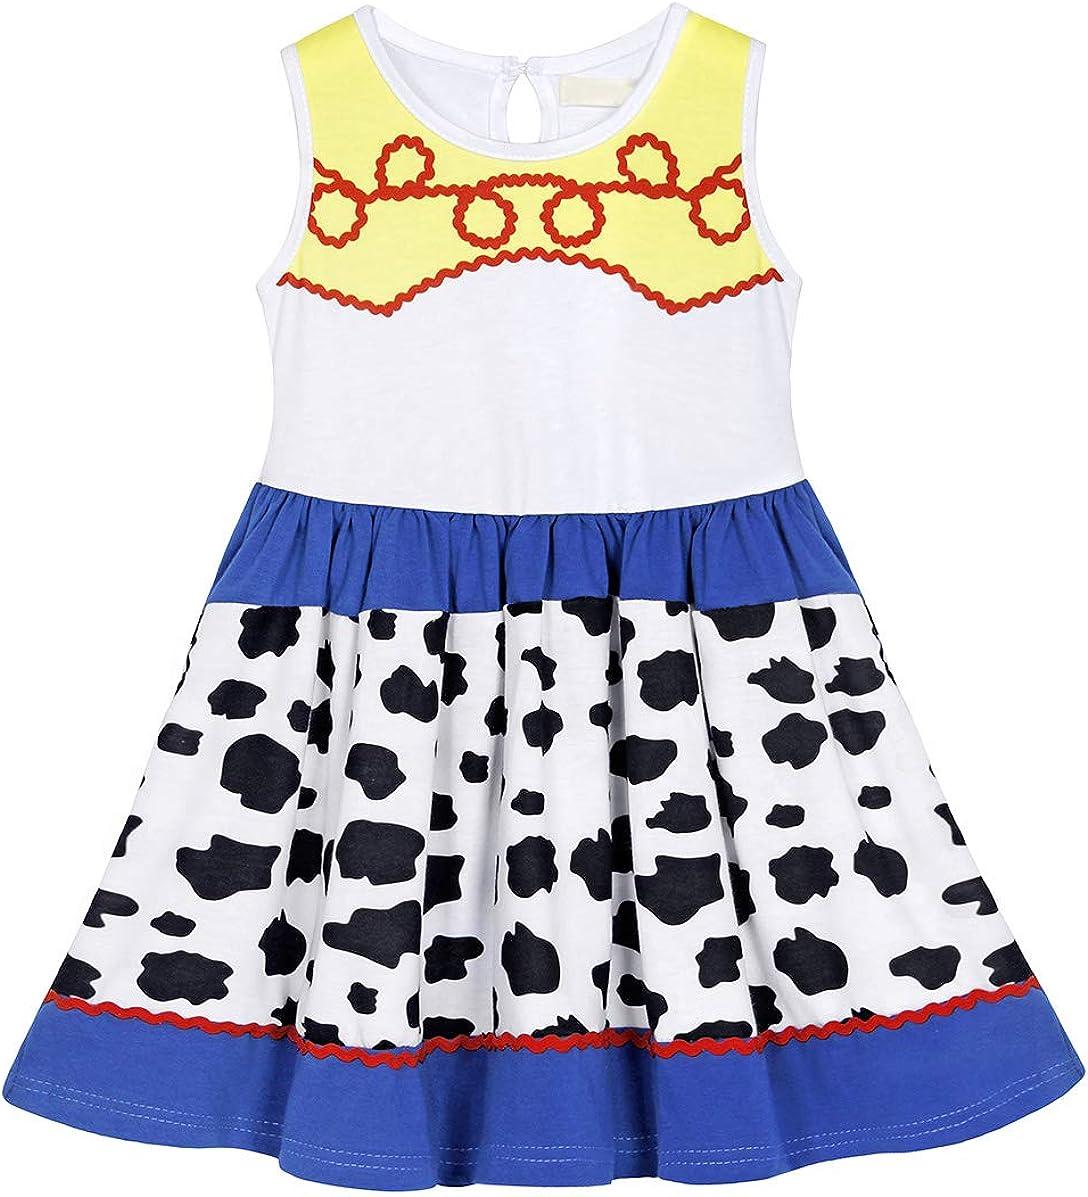 HenzWorld Little Girls Costume Dress Princess Birthday Cosplay Party Outfits Pajamas Sleeveless 3D Print